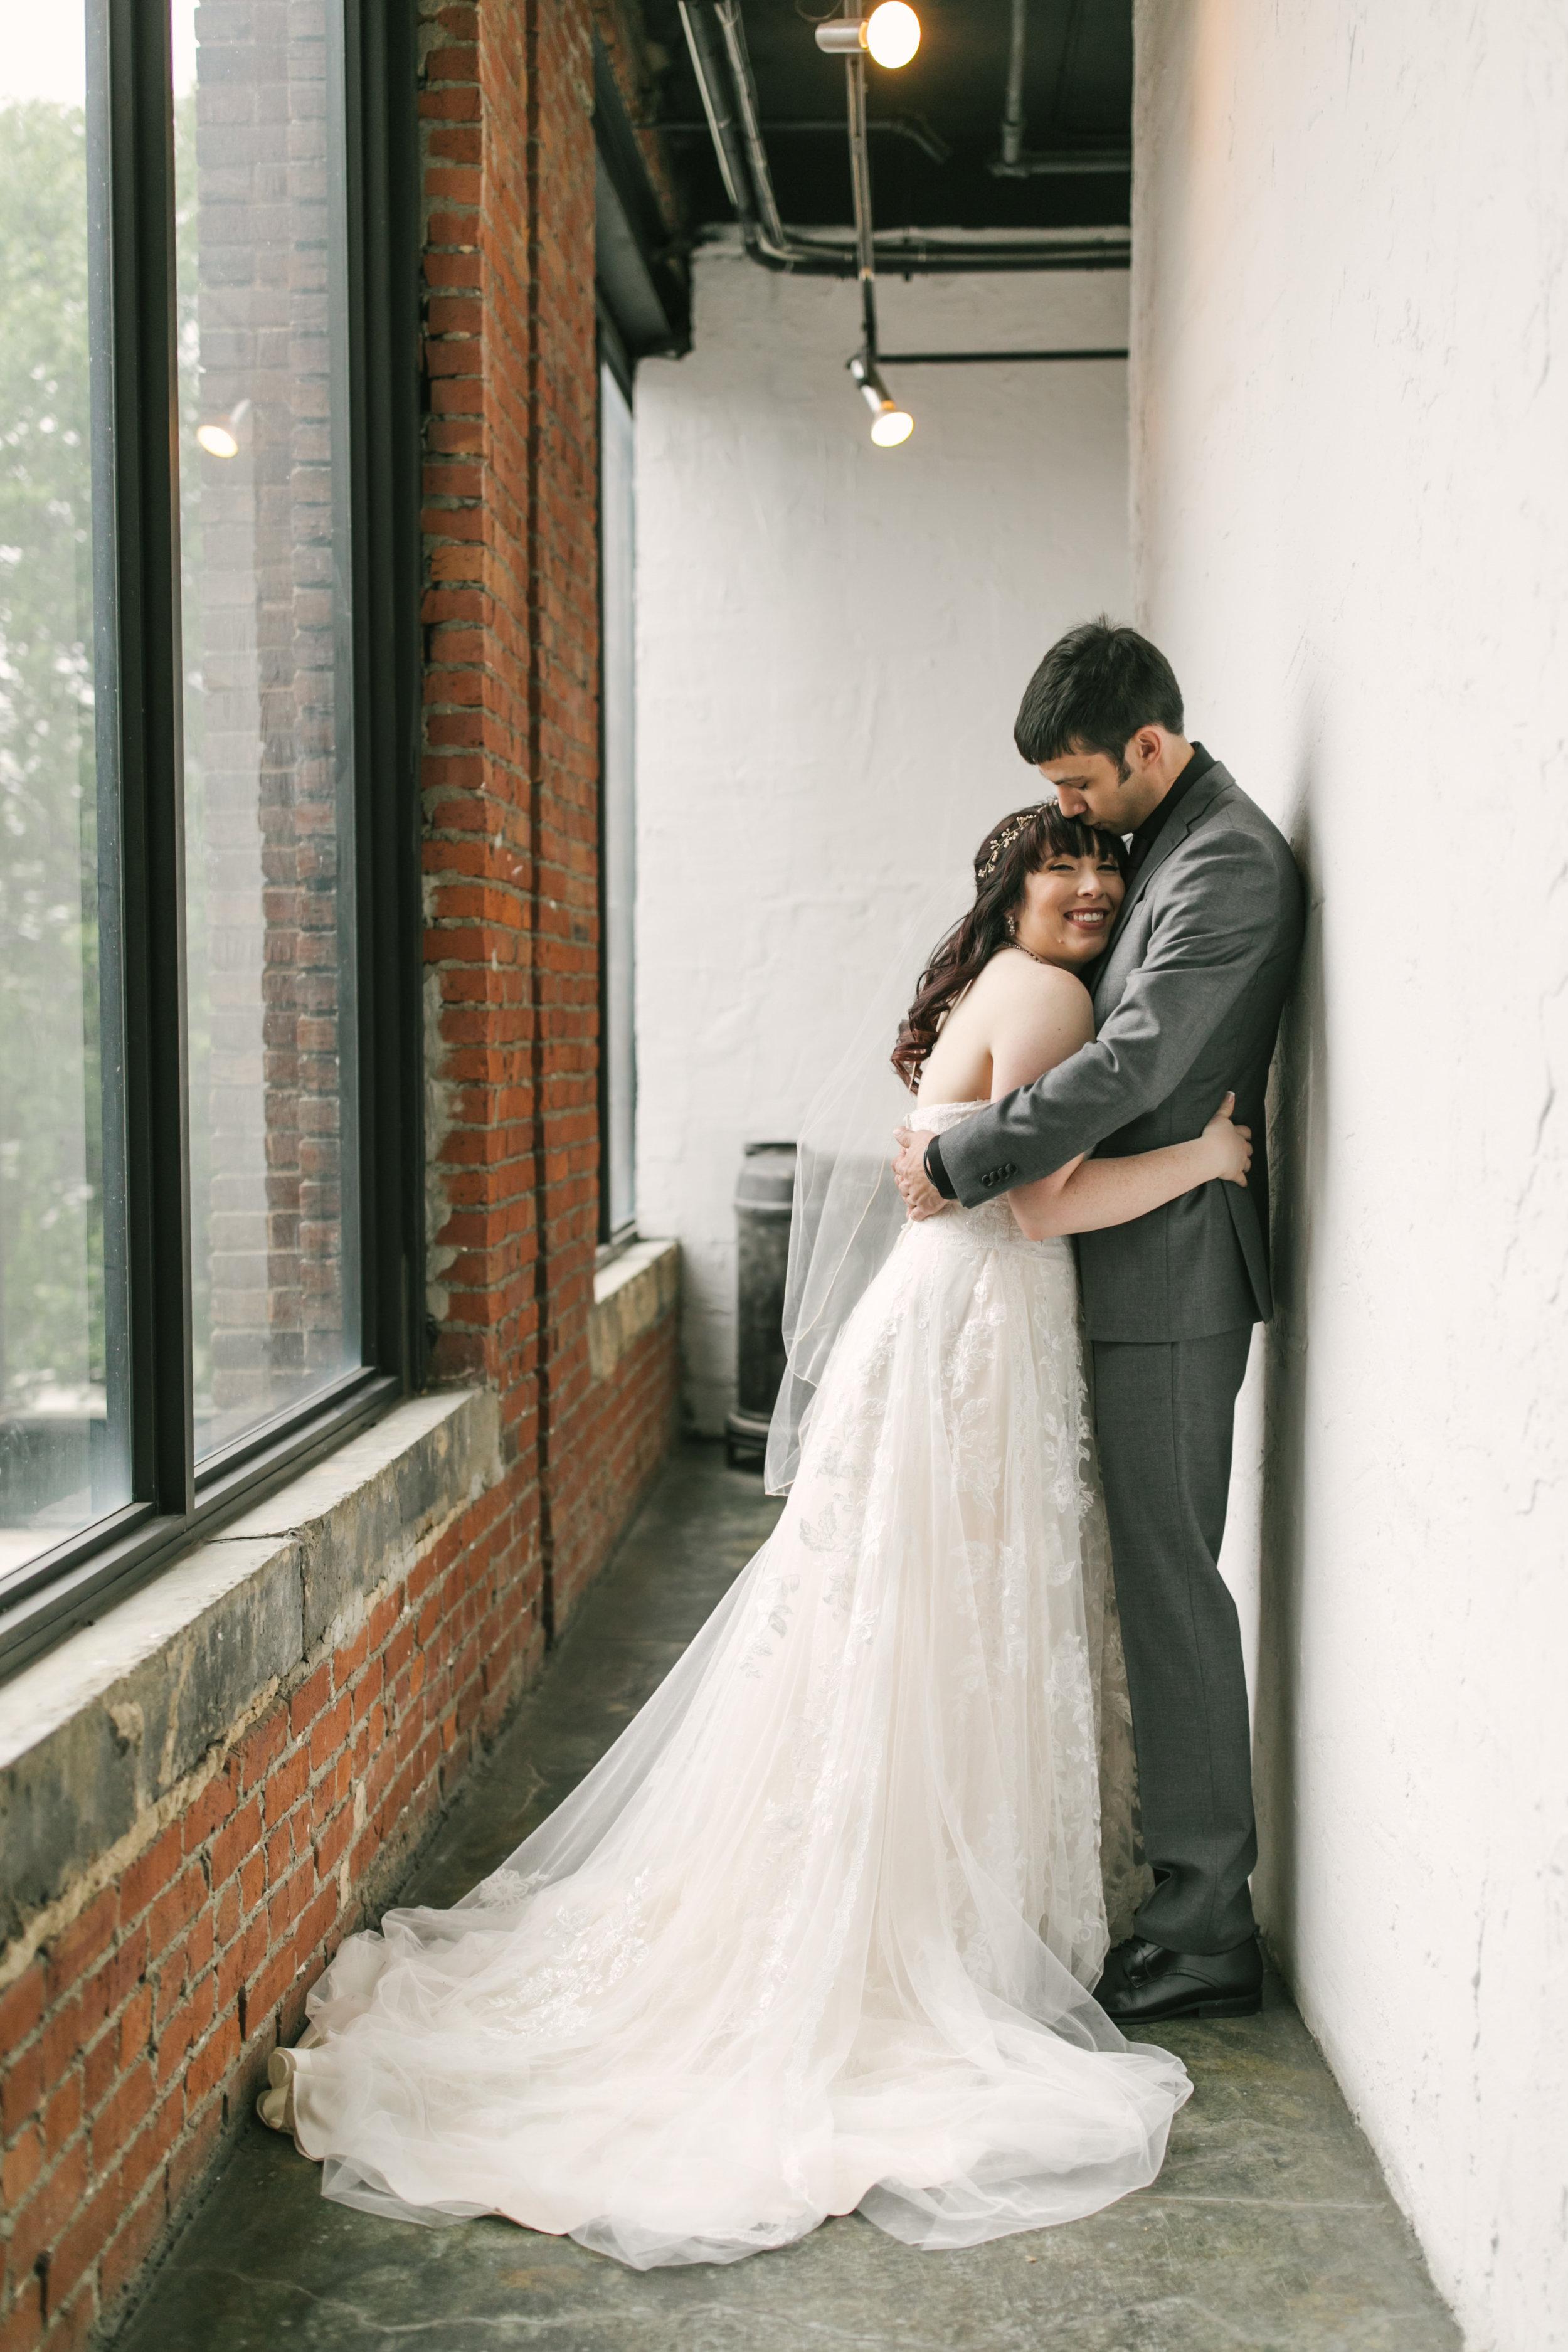 182_Colin+Jessica_Wedding.jpg